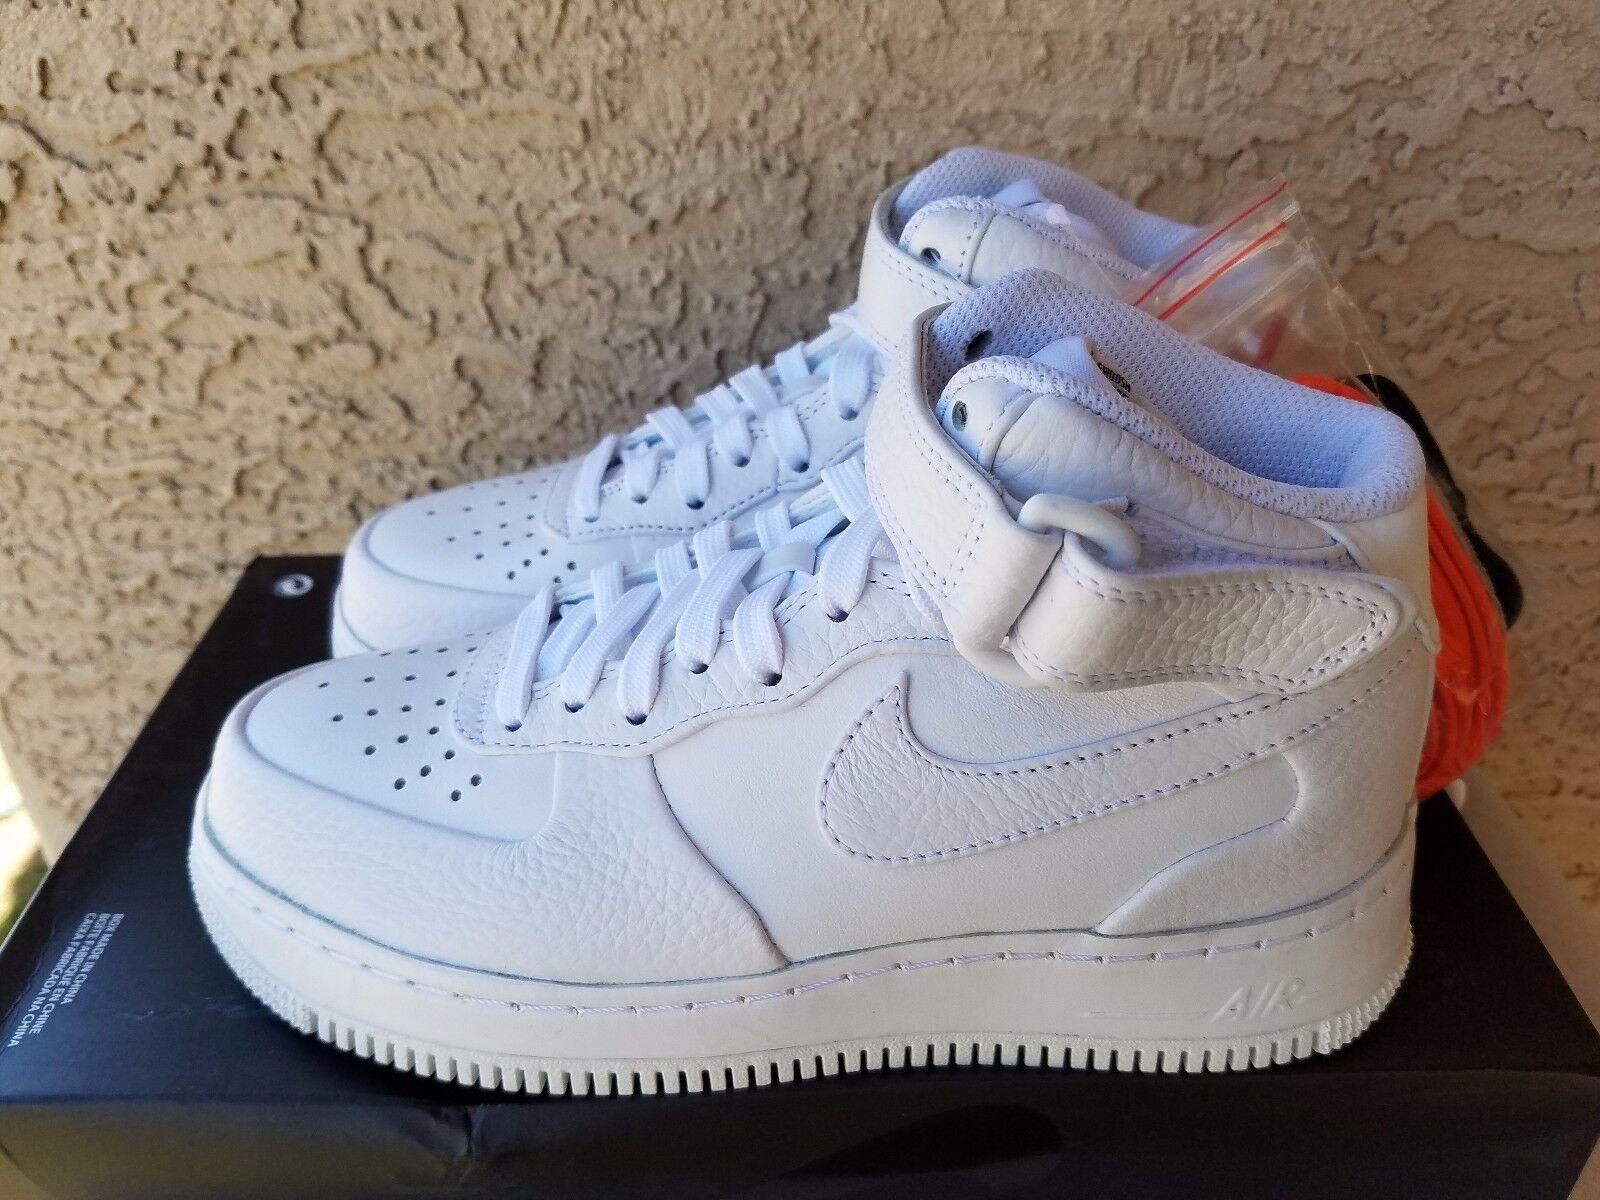 Nike Air Force 1 Mid CMFT SP x NikeLab Triple White Leather 718153-118 Women 5.5